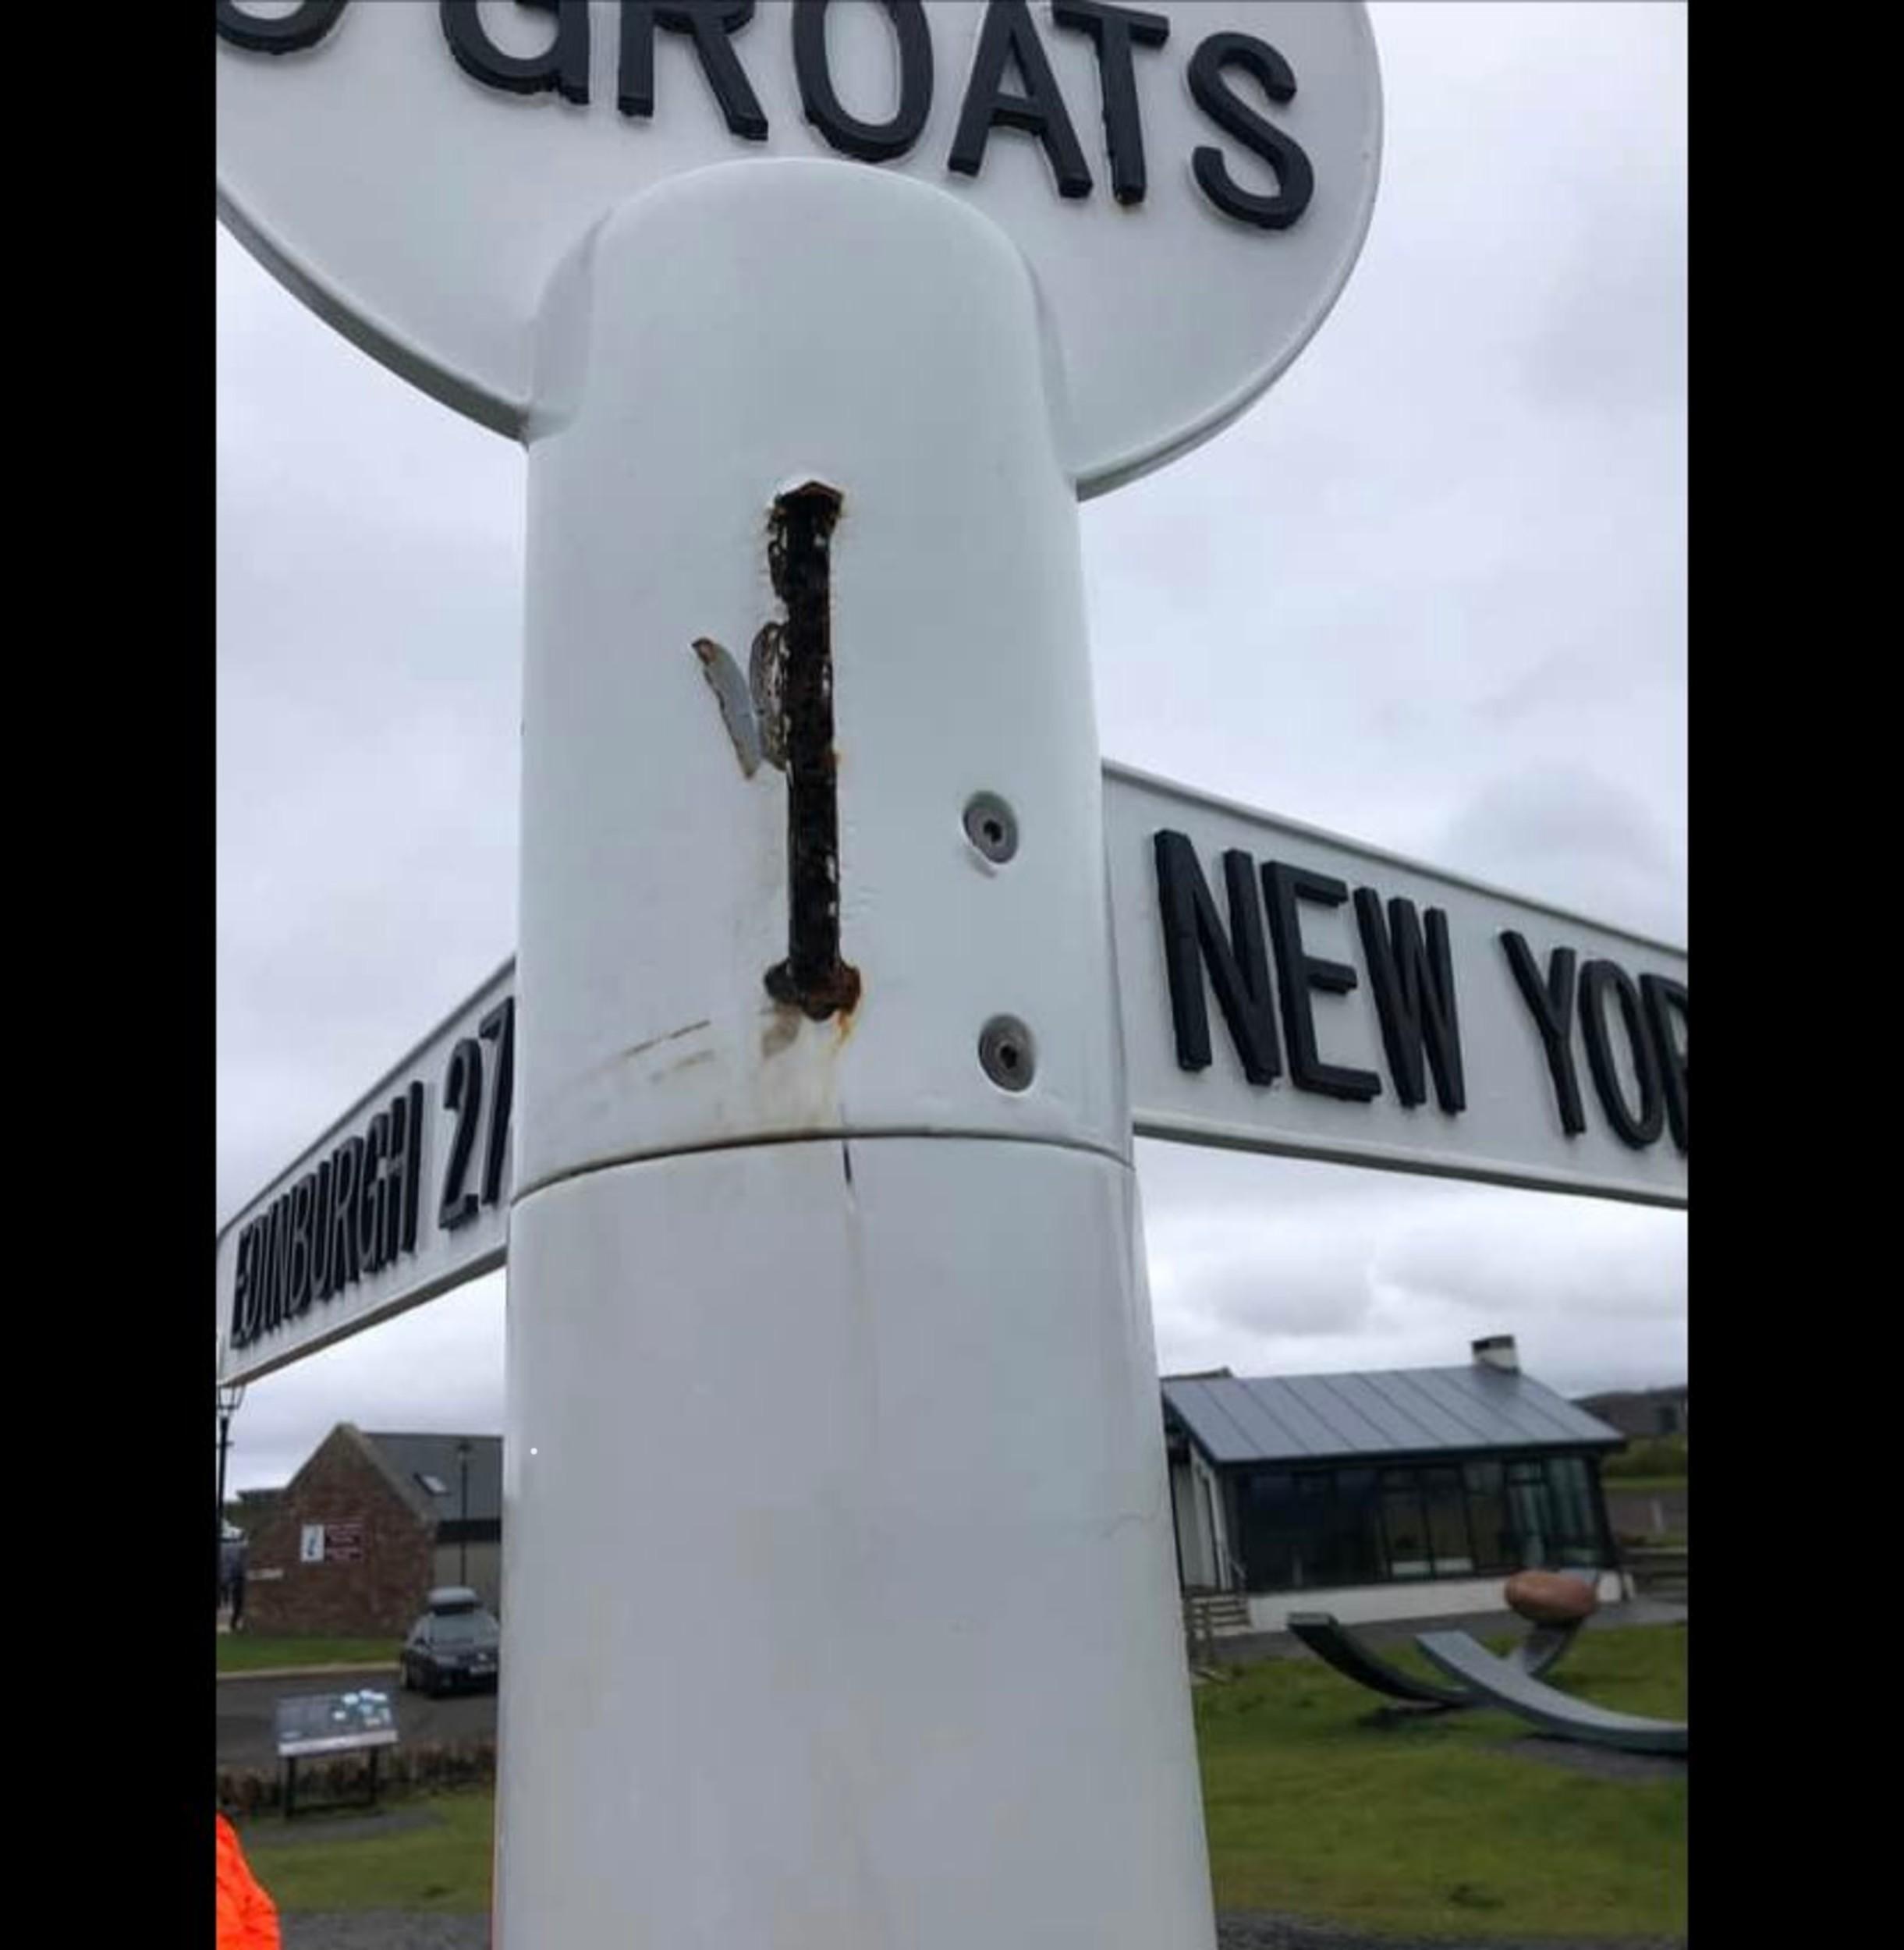 John O' Groats sign- Viral News